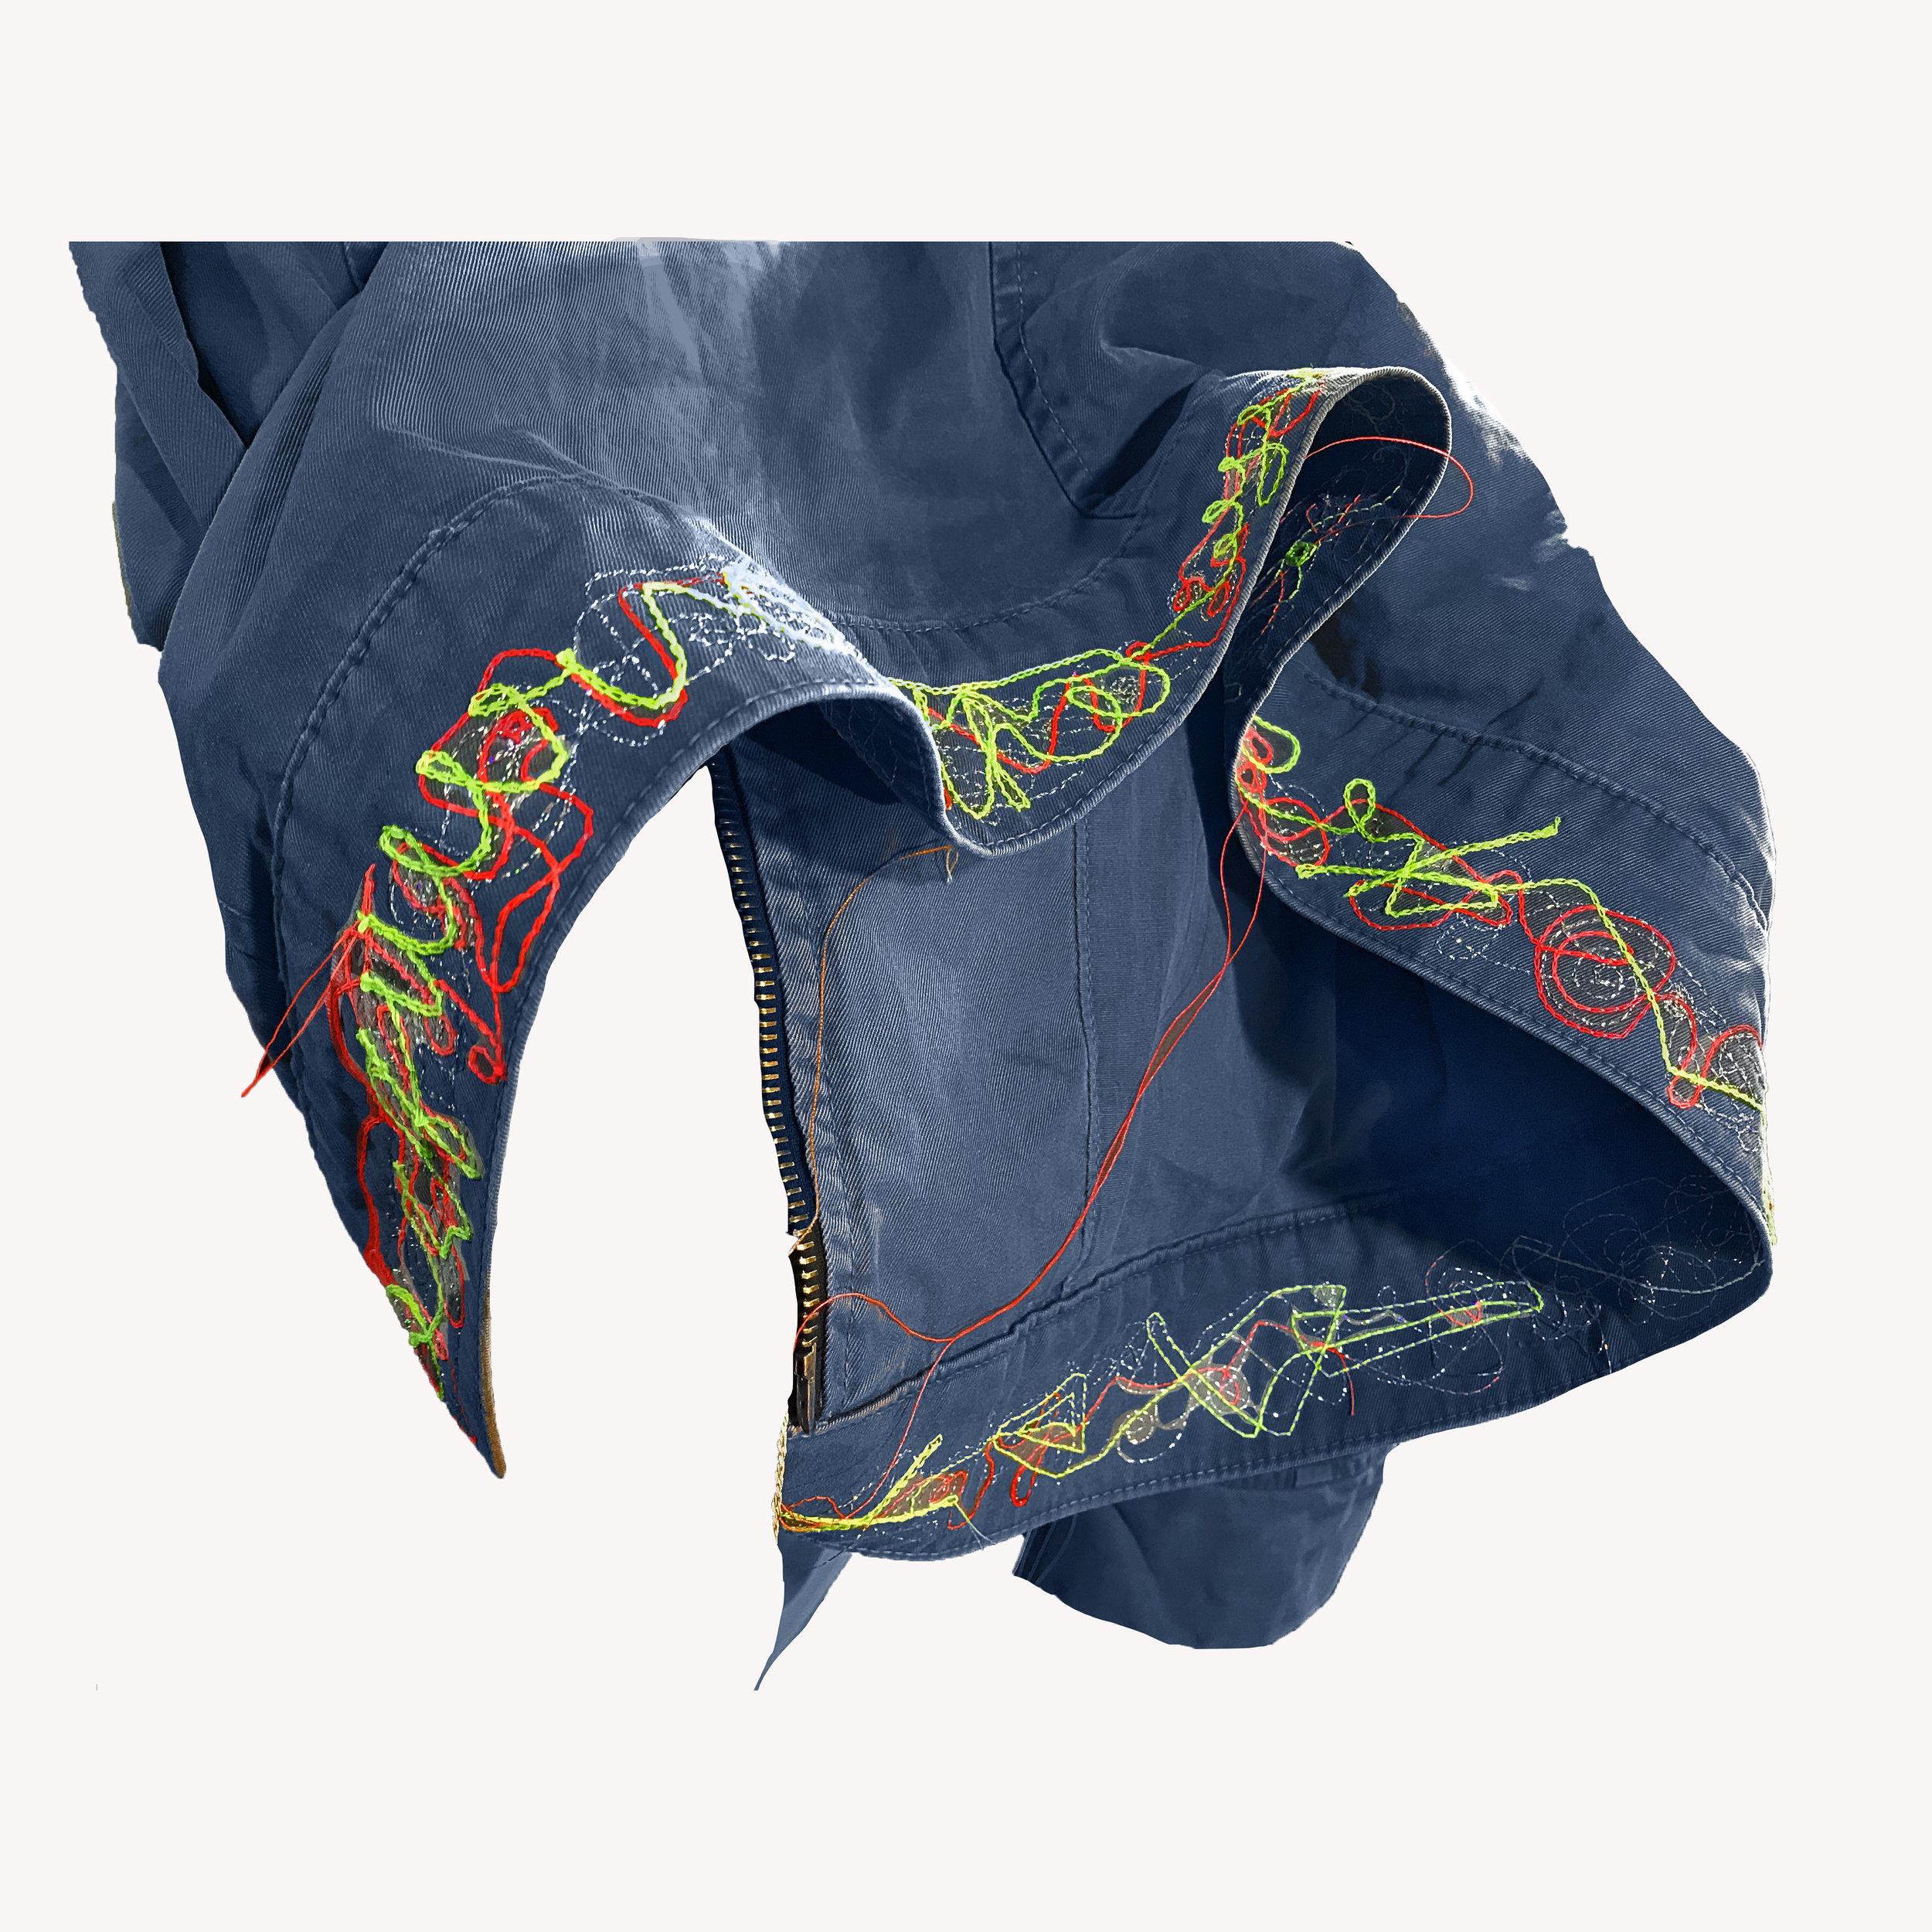 Jacket Close Up 3 copy.jpg